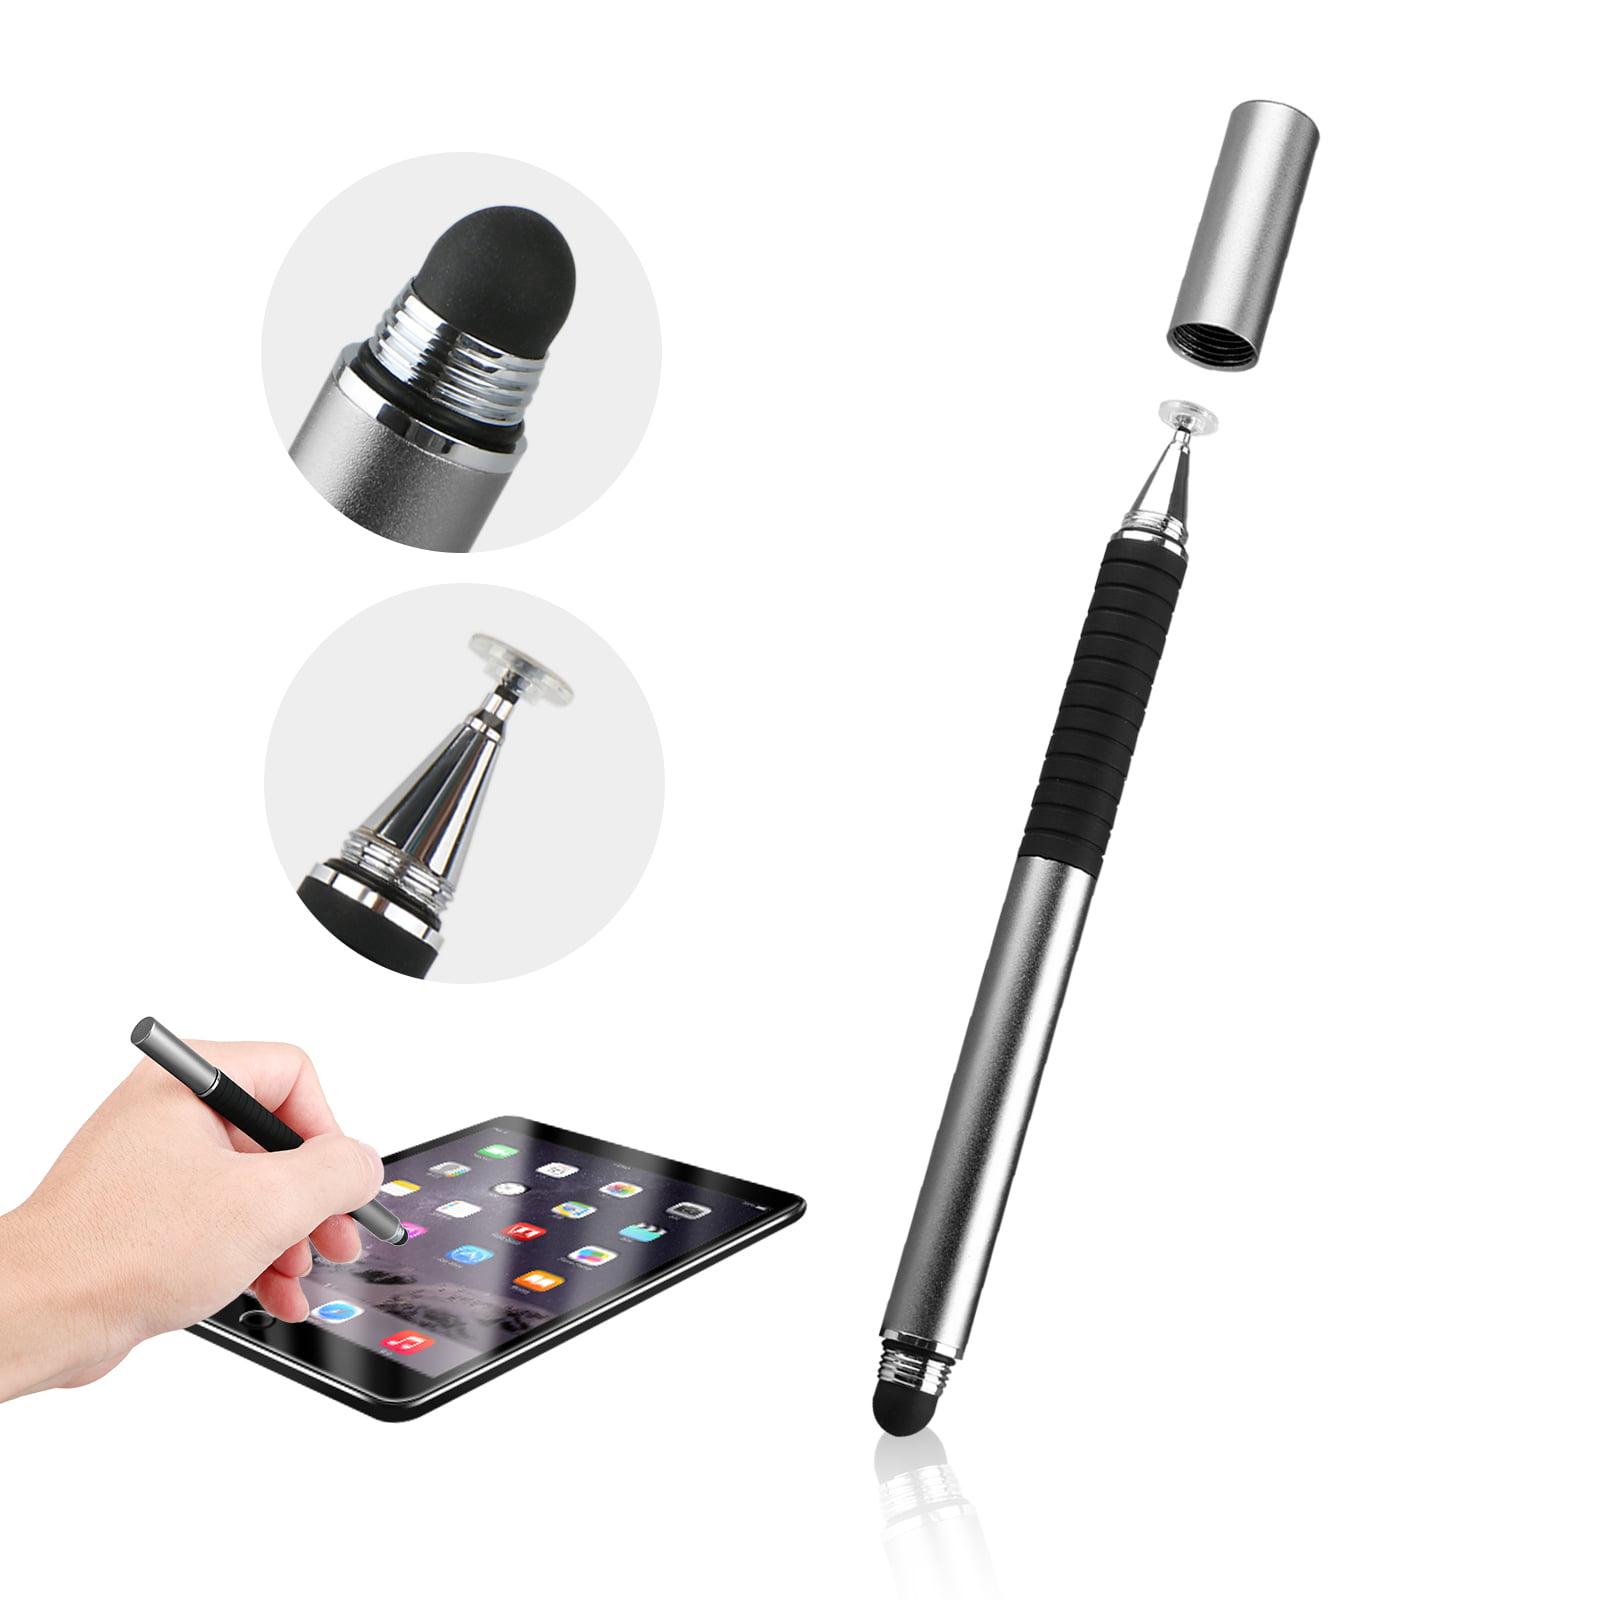 EEEkit 2 in 1 Luxury Fine Point Stylus Pen for Apple iPad Air, iPhone X ,Samsung Galaxy Tablet S 8.0/9.7, Pro 8.4/10.1,